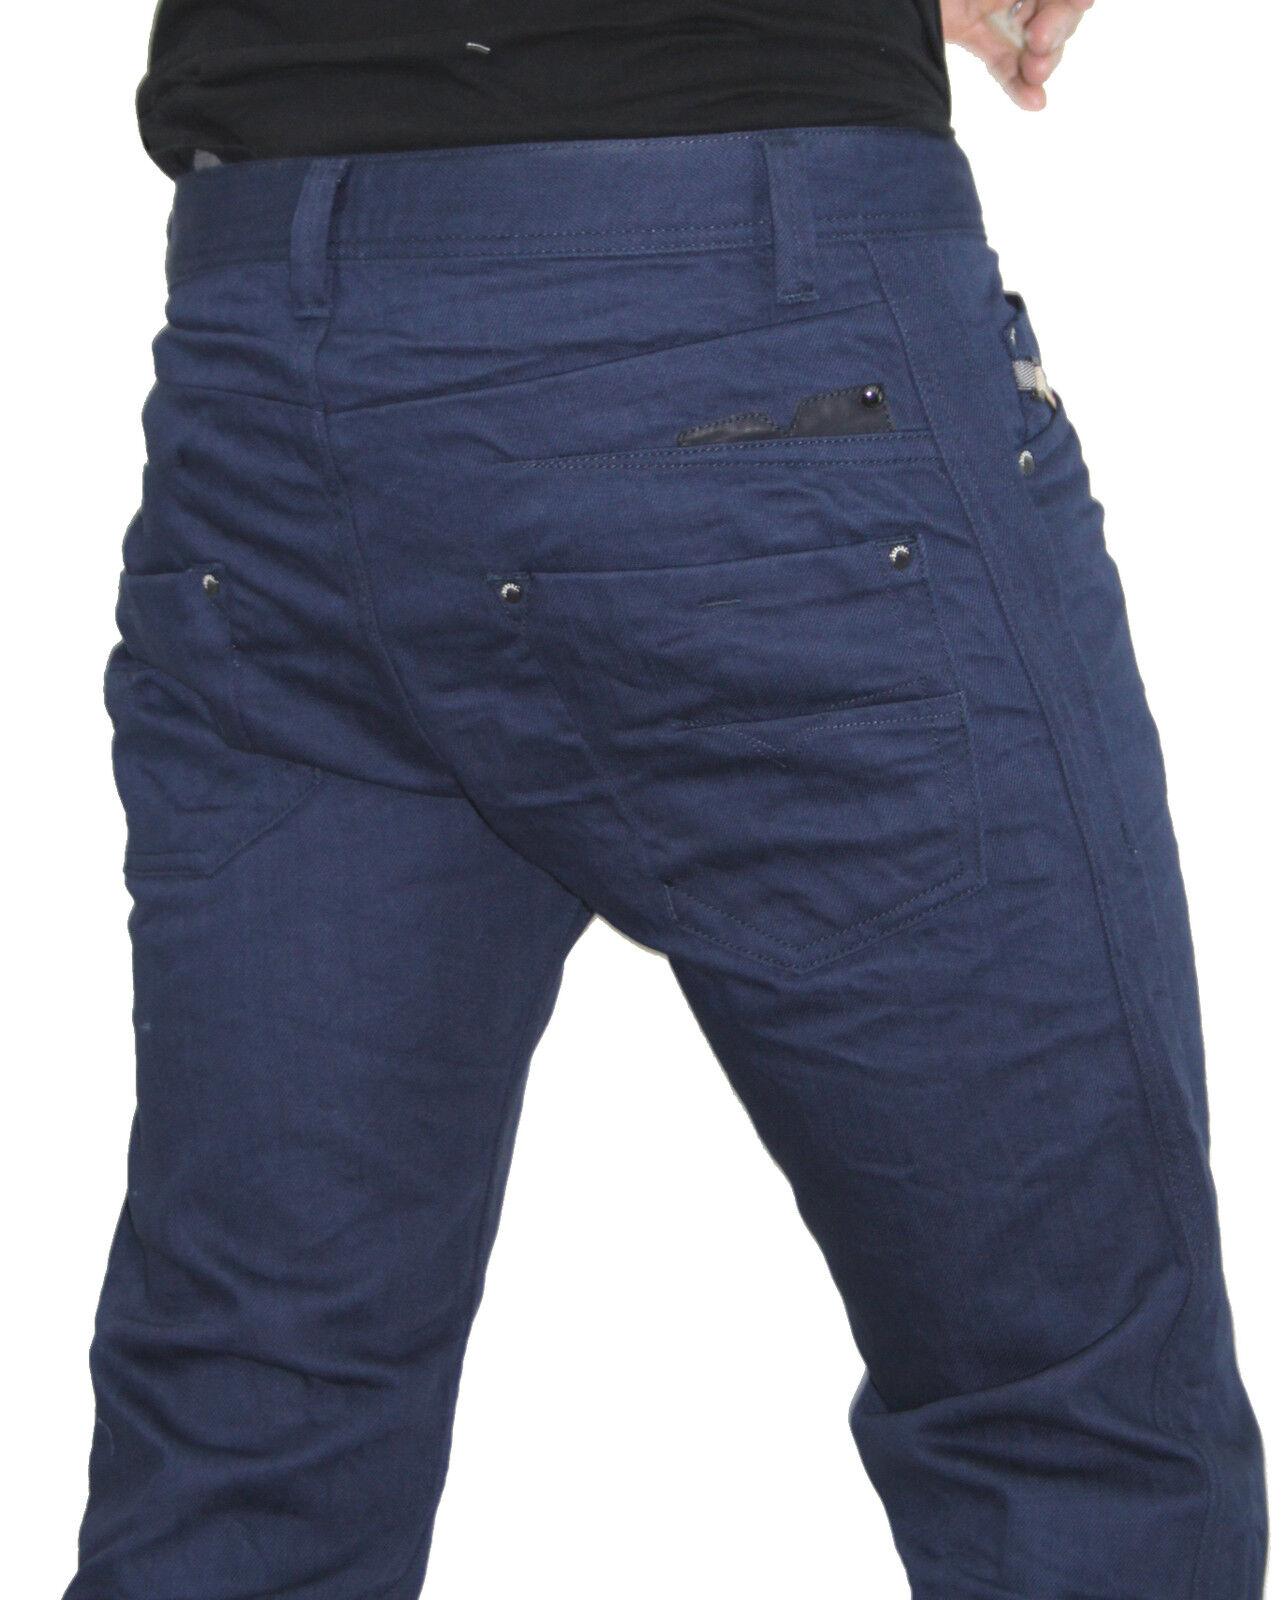 NWT DIESEL Fashion Men Slim Tapered Leg Darron 8QU Midnight bluee Pants Jeans